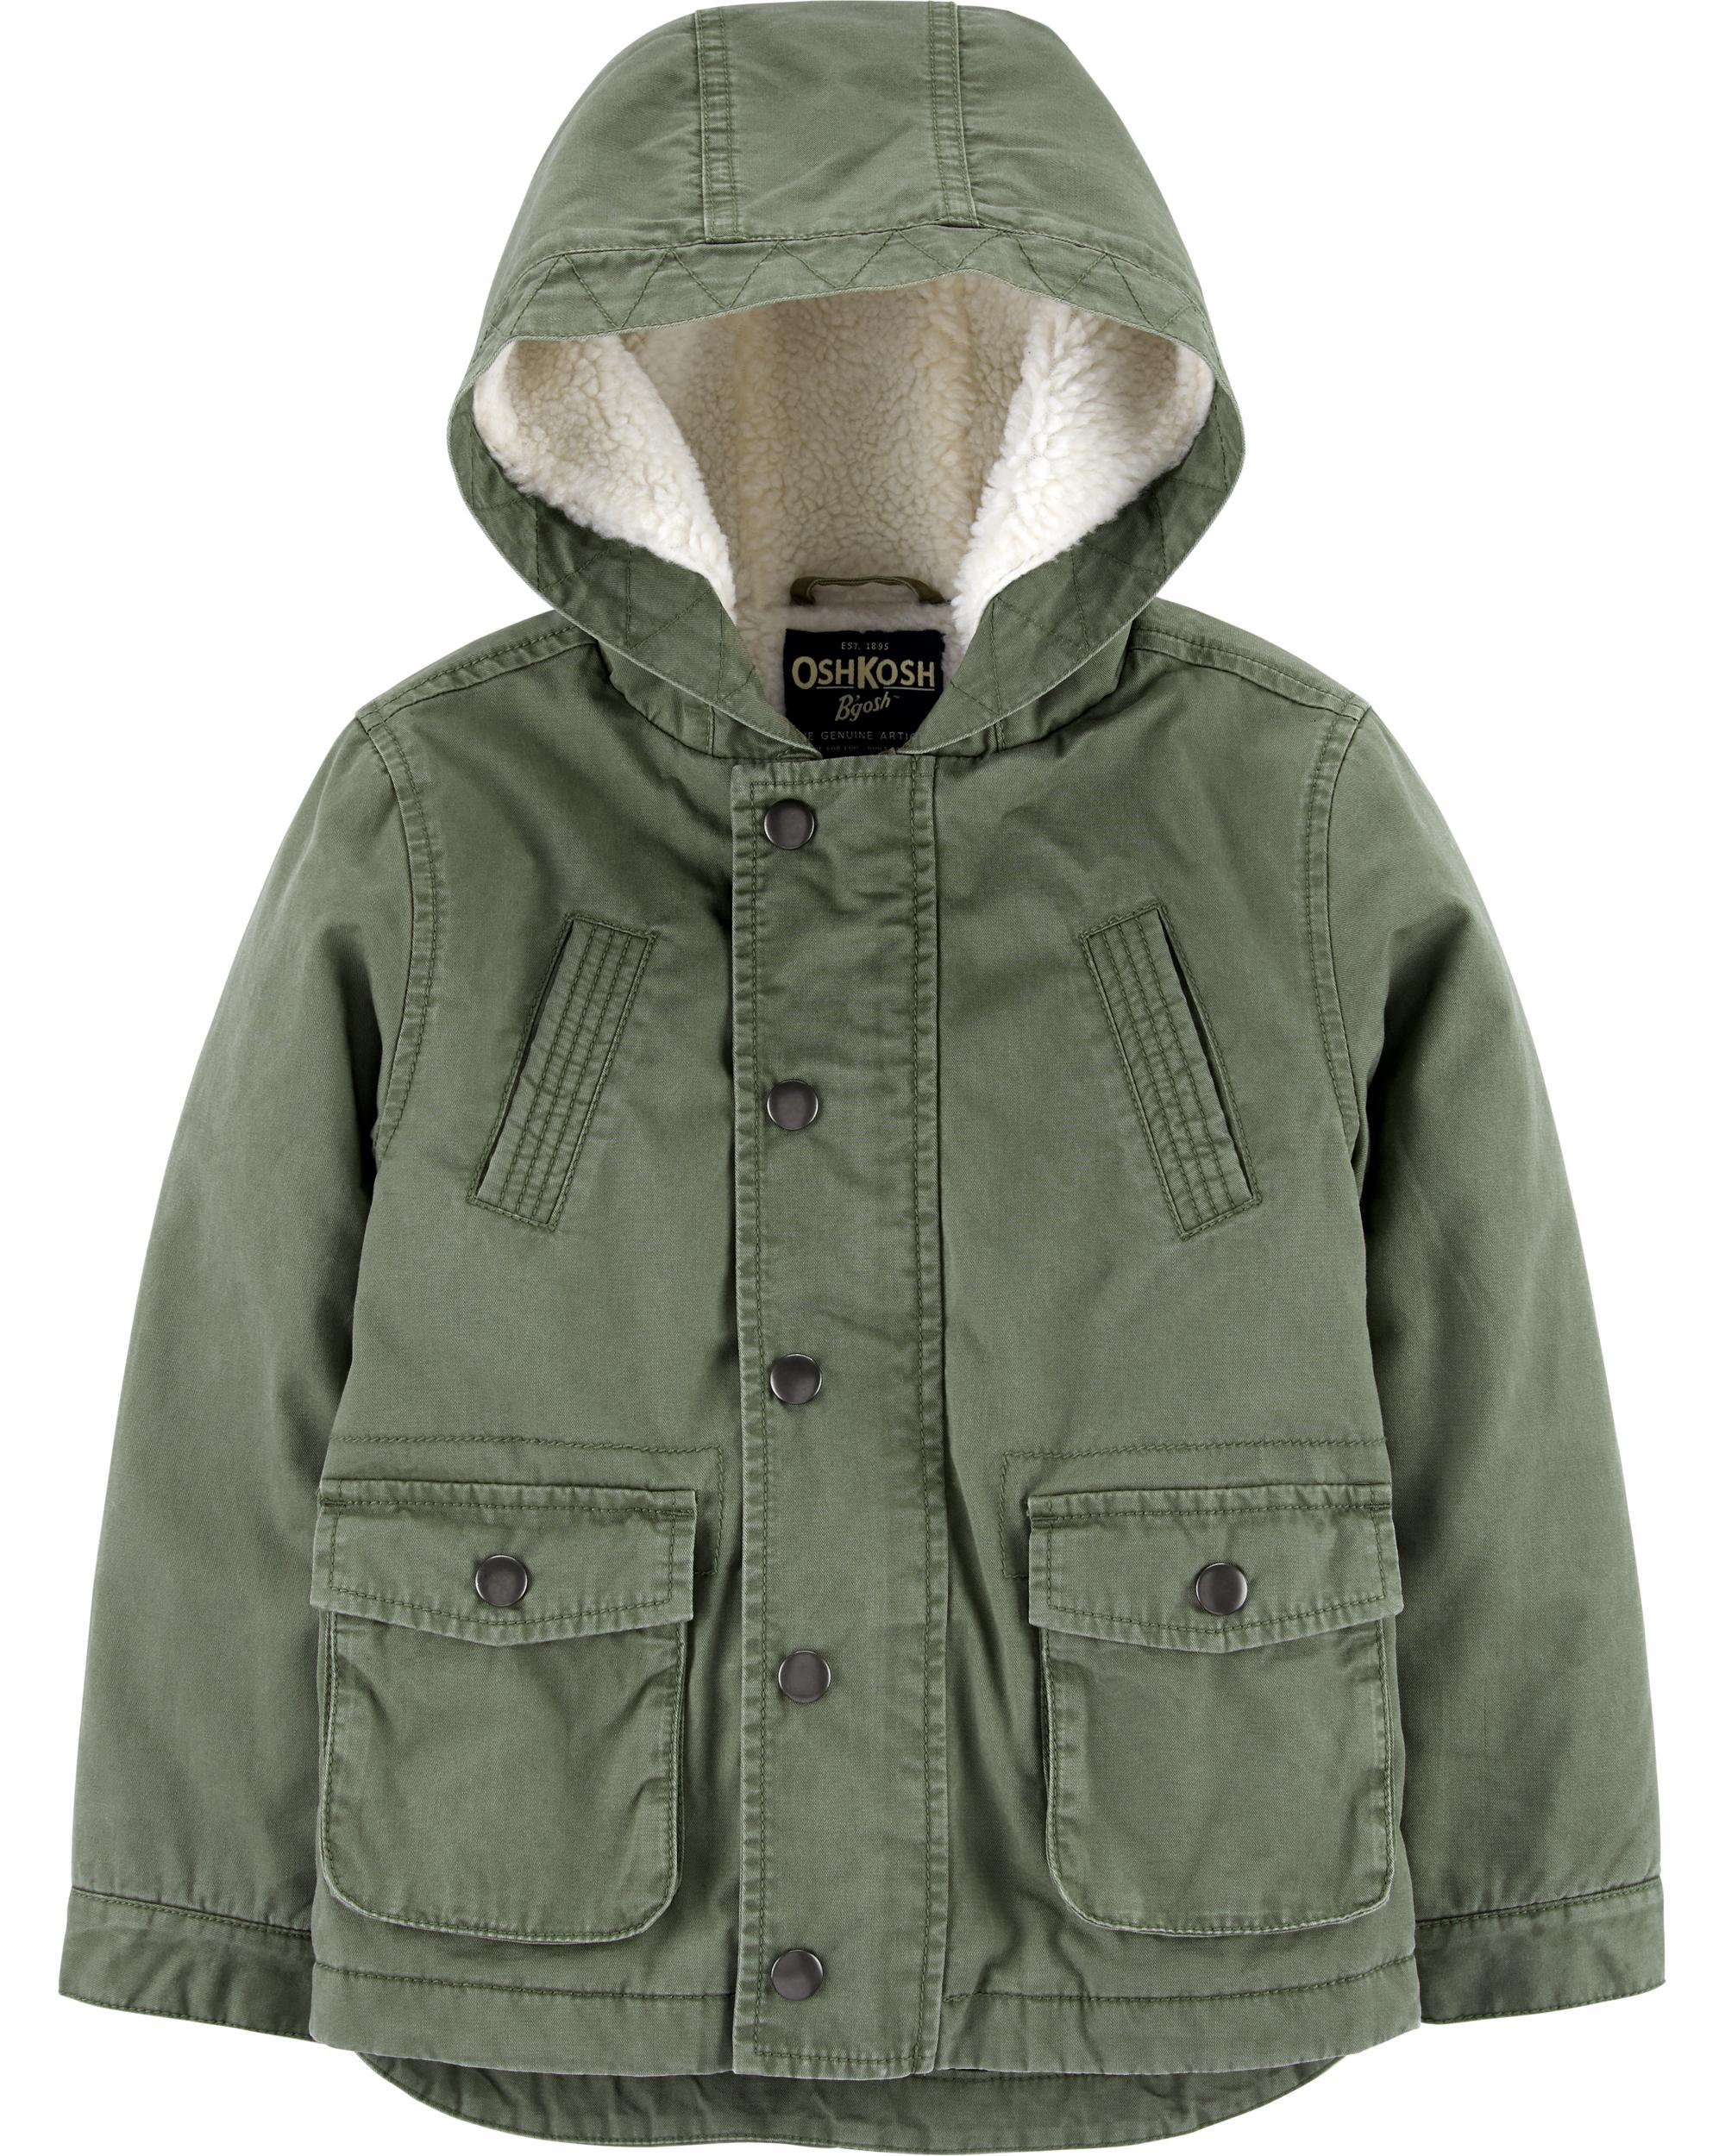 Field Jacket Oshkosh Com